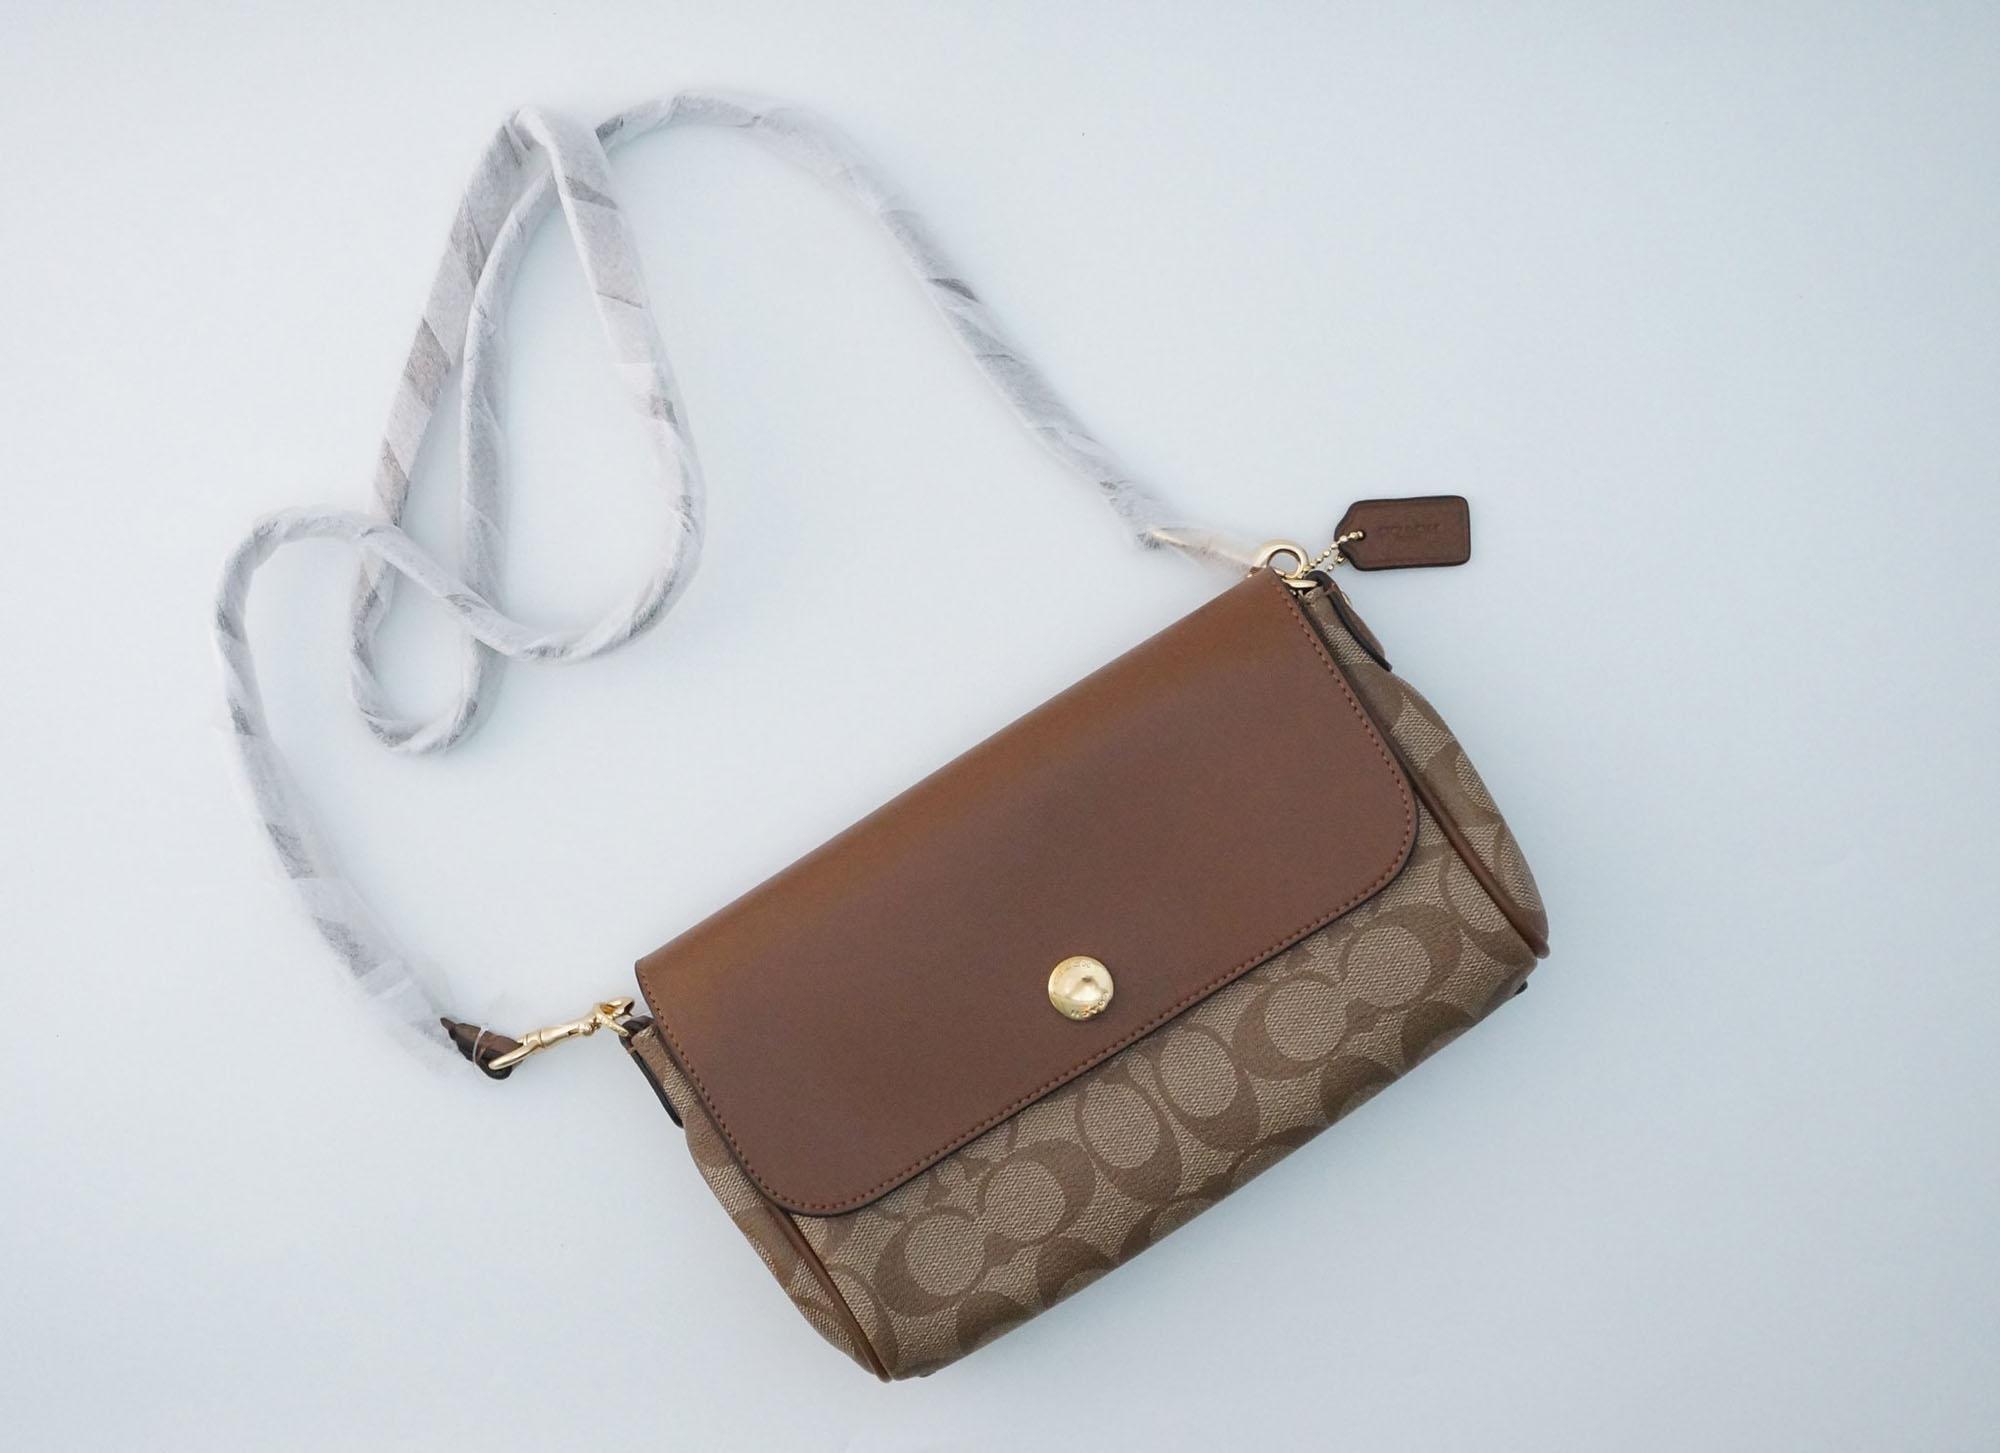 Jual Tas Wanita Coach Terbaru Scarlet Bag Hijau  Import Korea Pesta Reversible Crossbody F59534